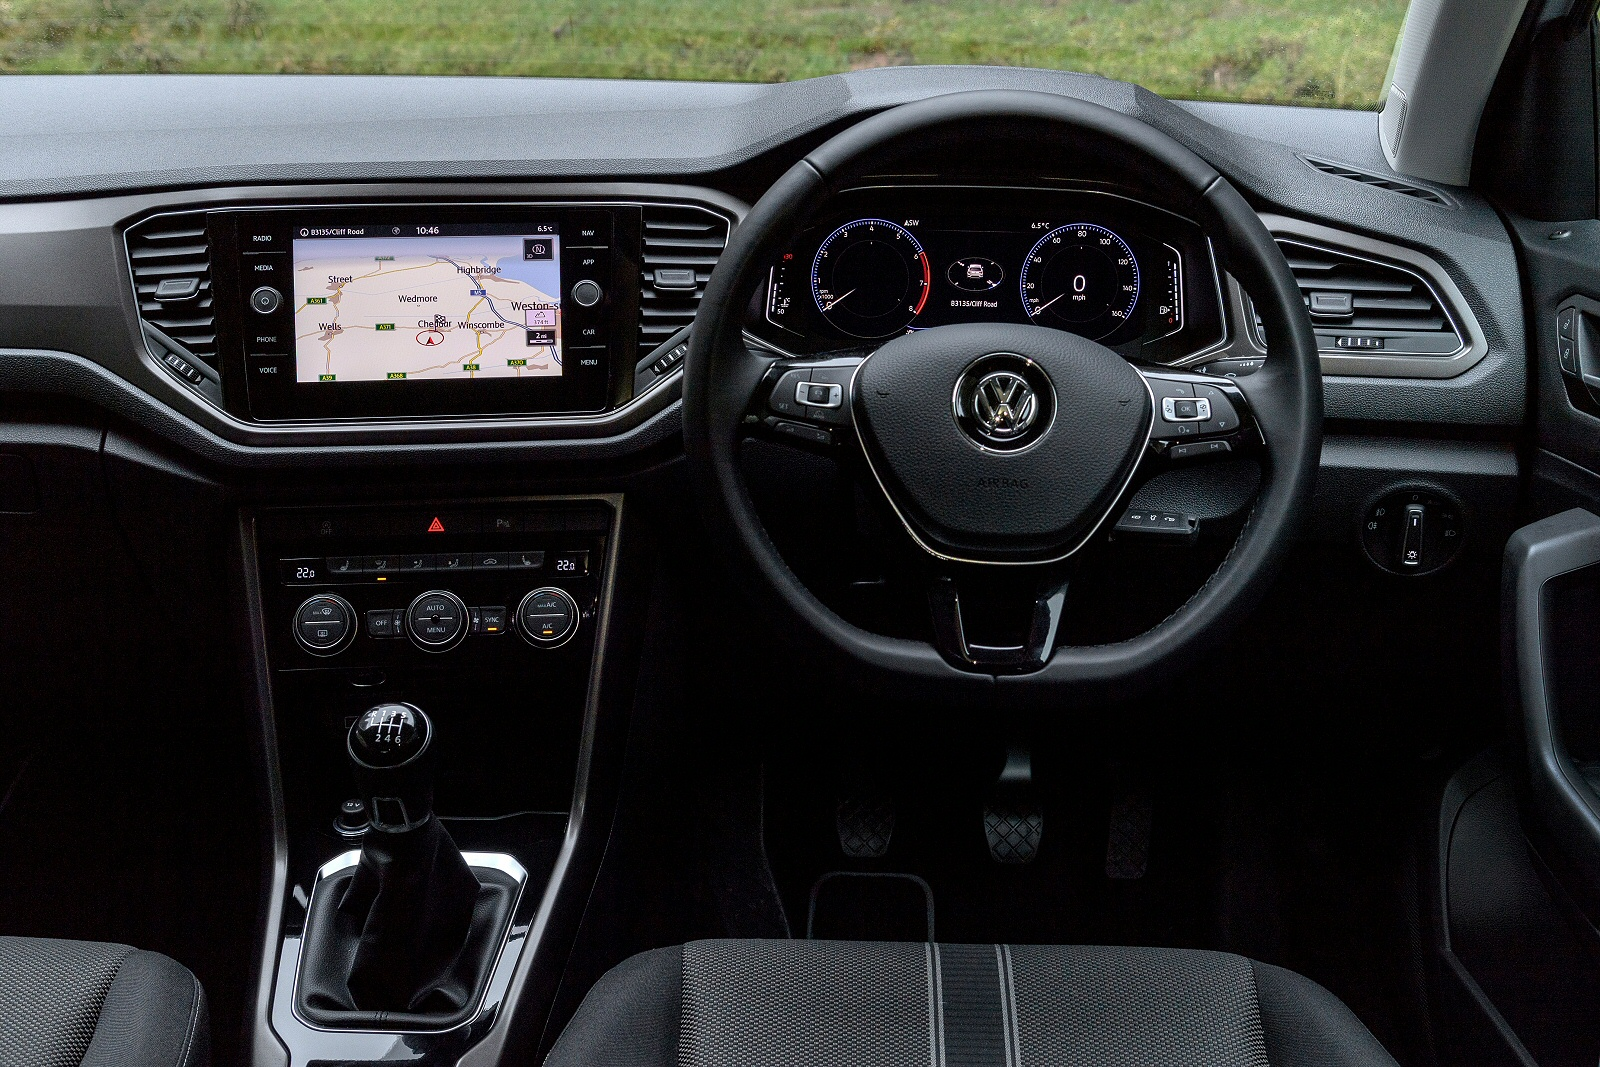 ... 1.5 Tsi Evo Design 5Dr Dsg Petrol Hatchback